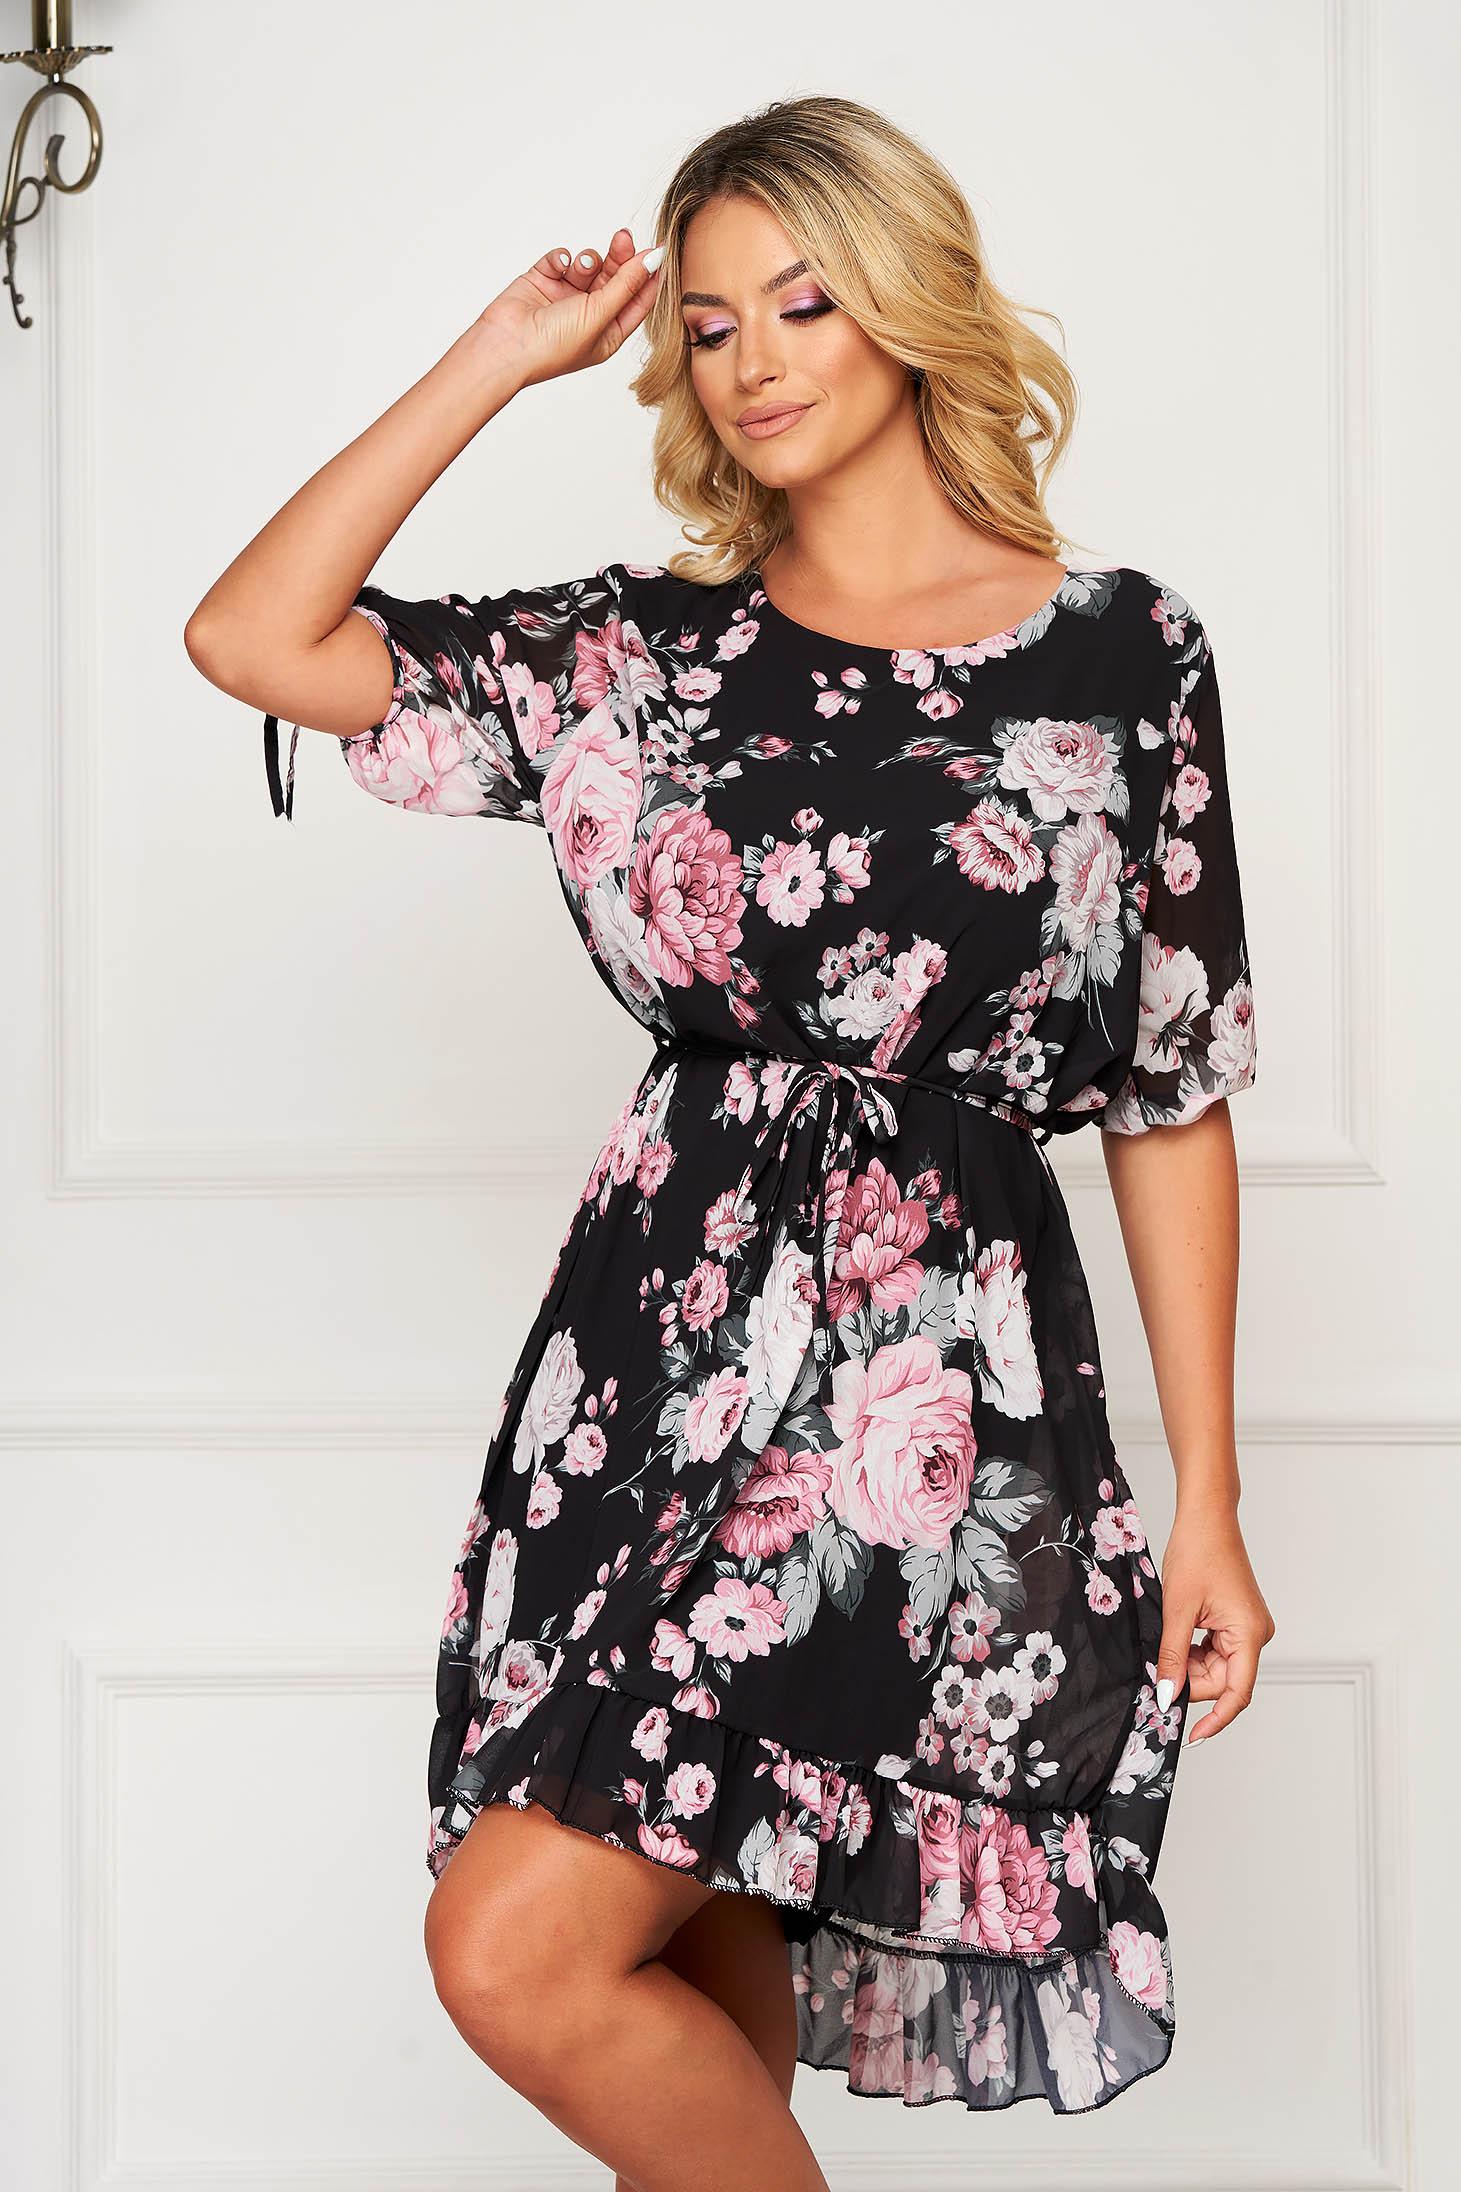 Black dress short cut daily from veil fabric straight short sleeves